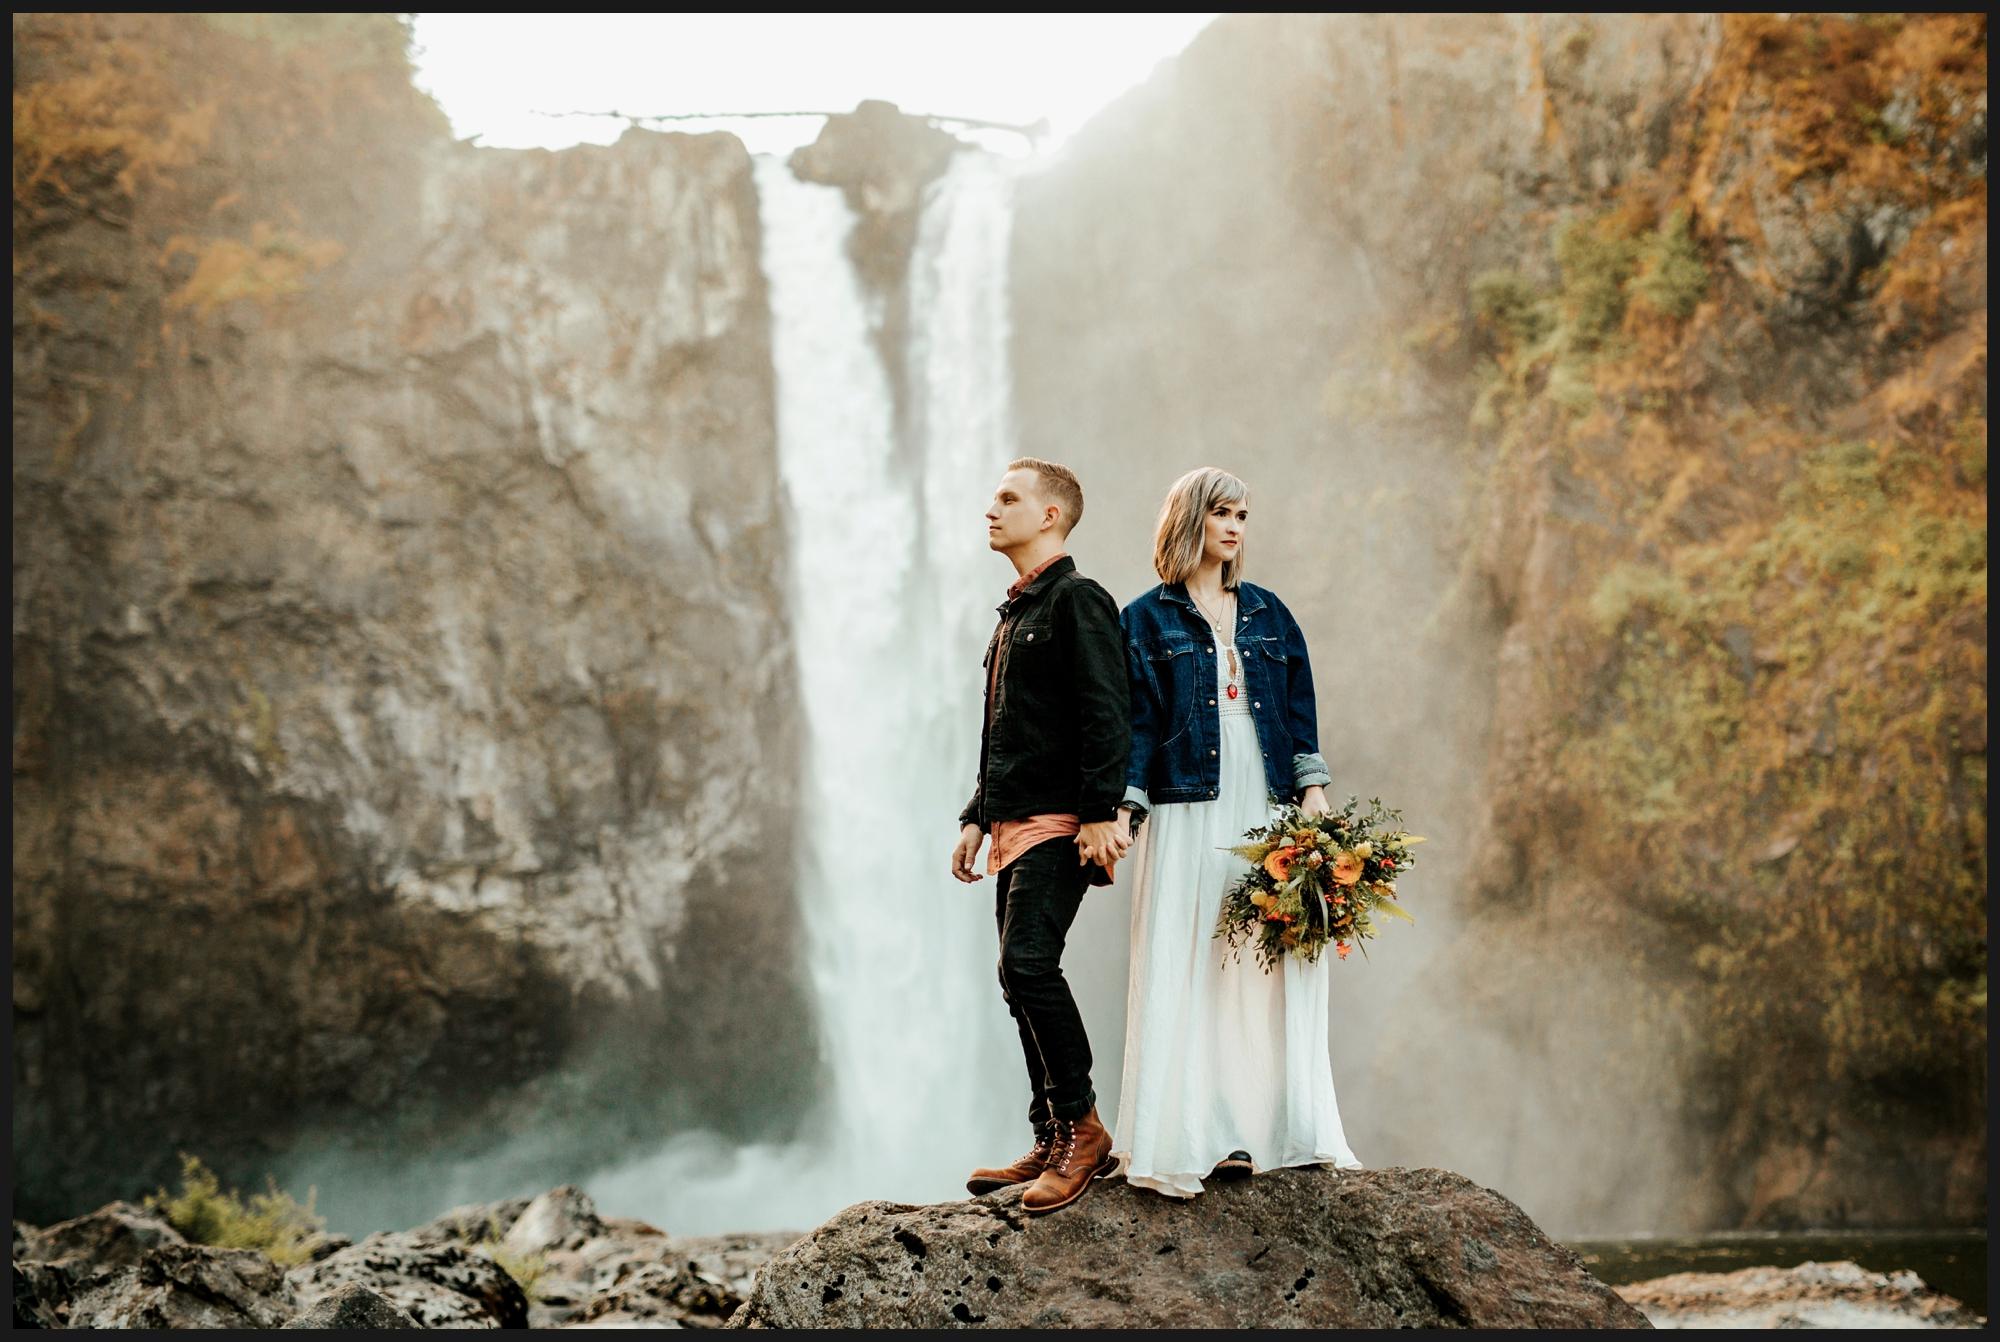 Orlando-Wedding-Photographer-destination-wedding-photographer-florida-wedding-photographer-bohemian-wedding-photographer_0416.jpg